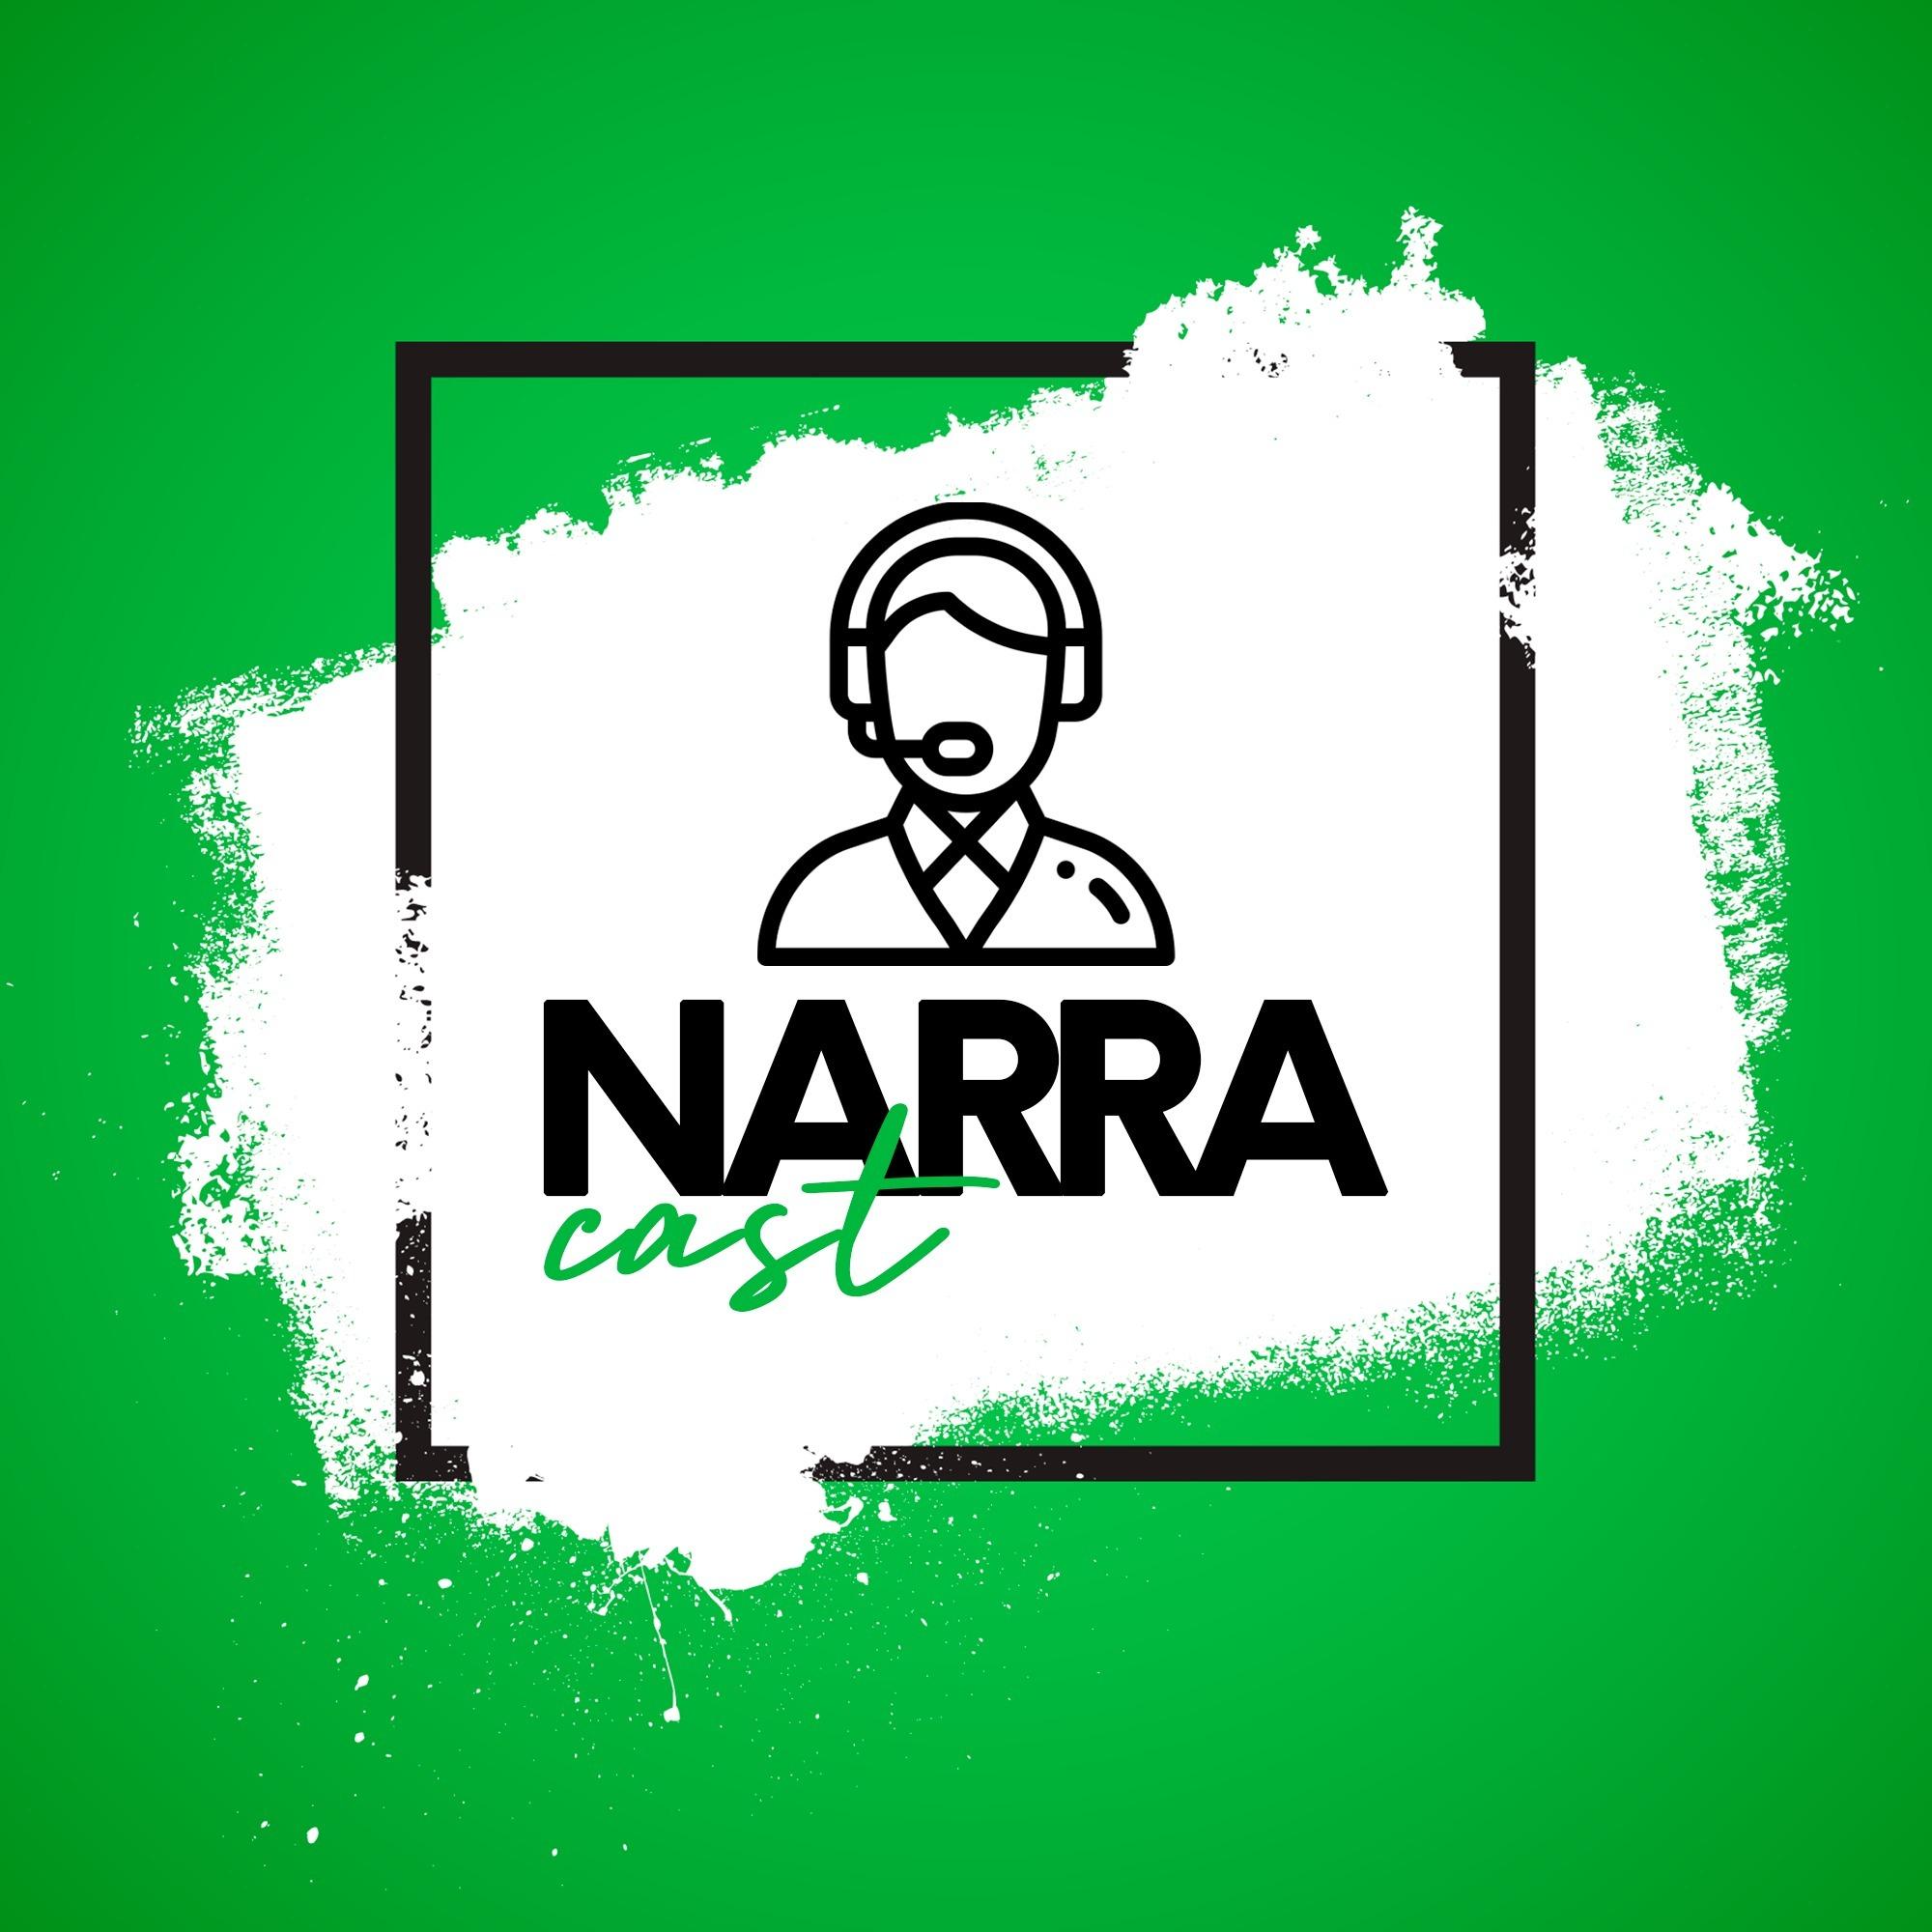 NarraCast:Narracast